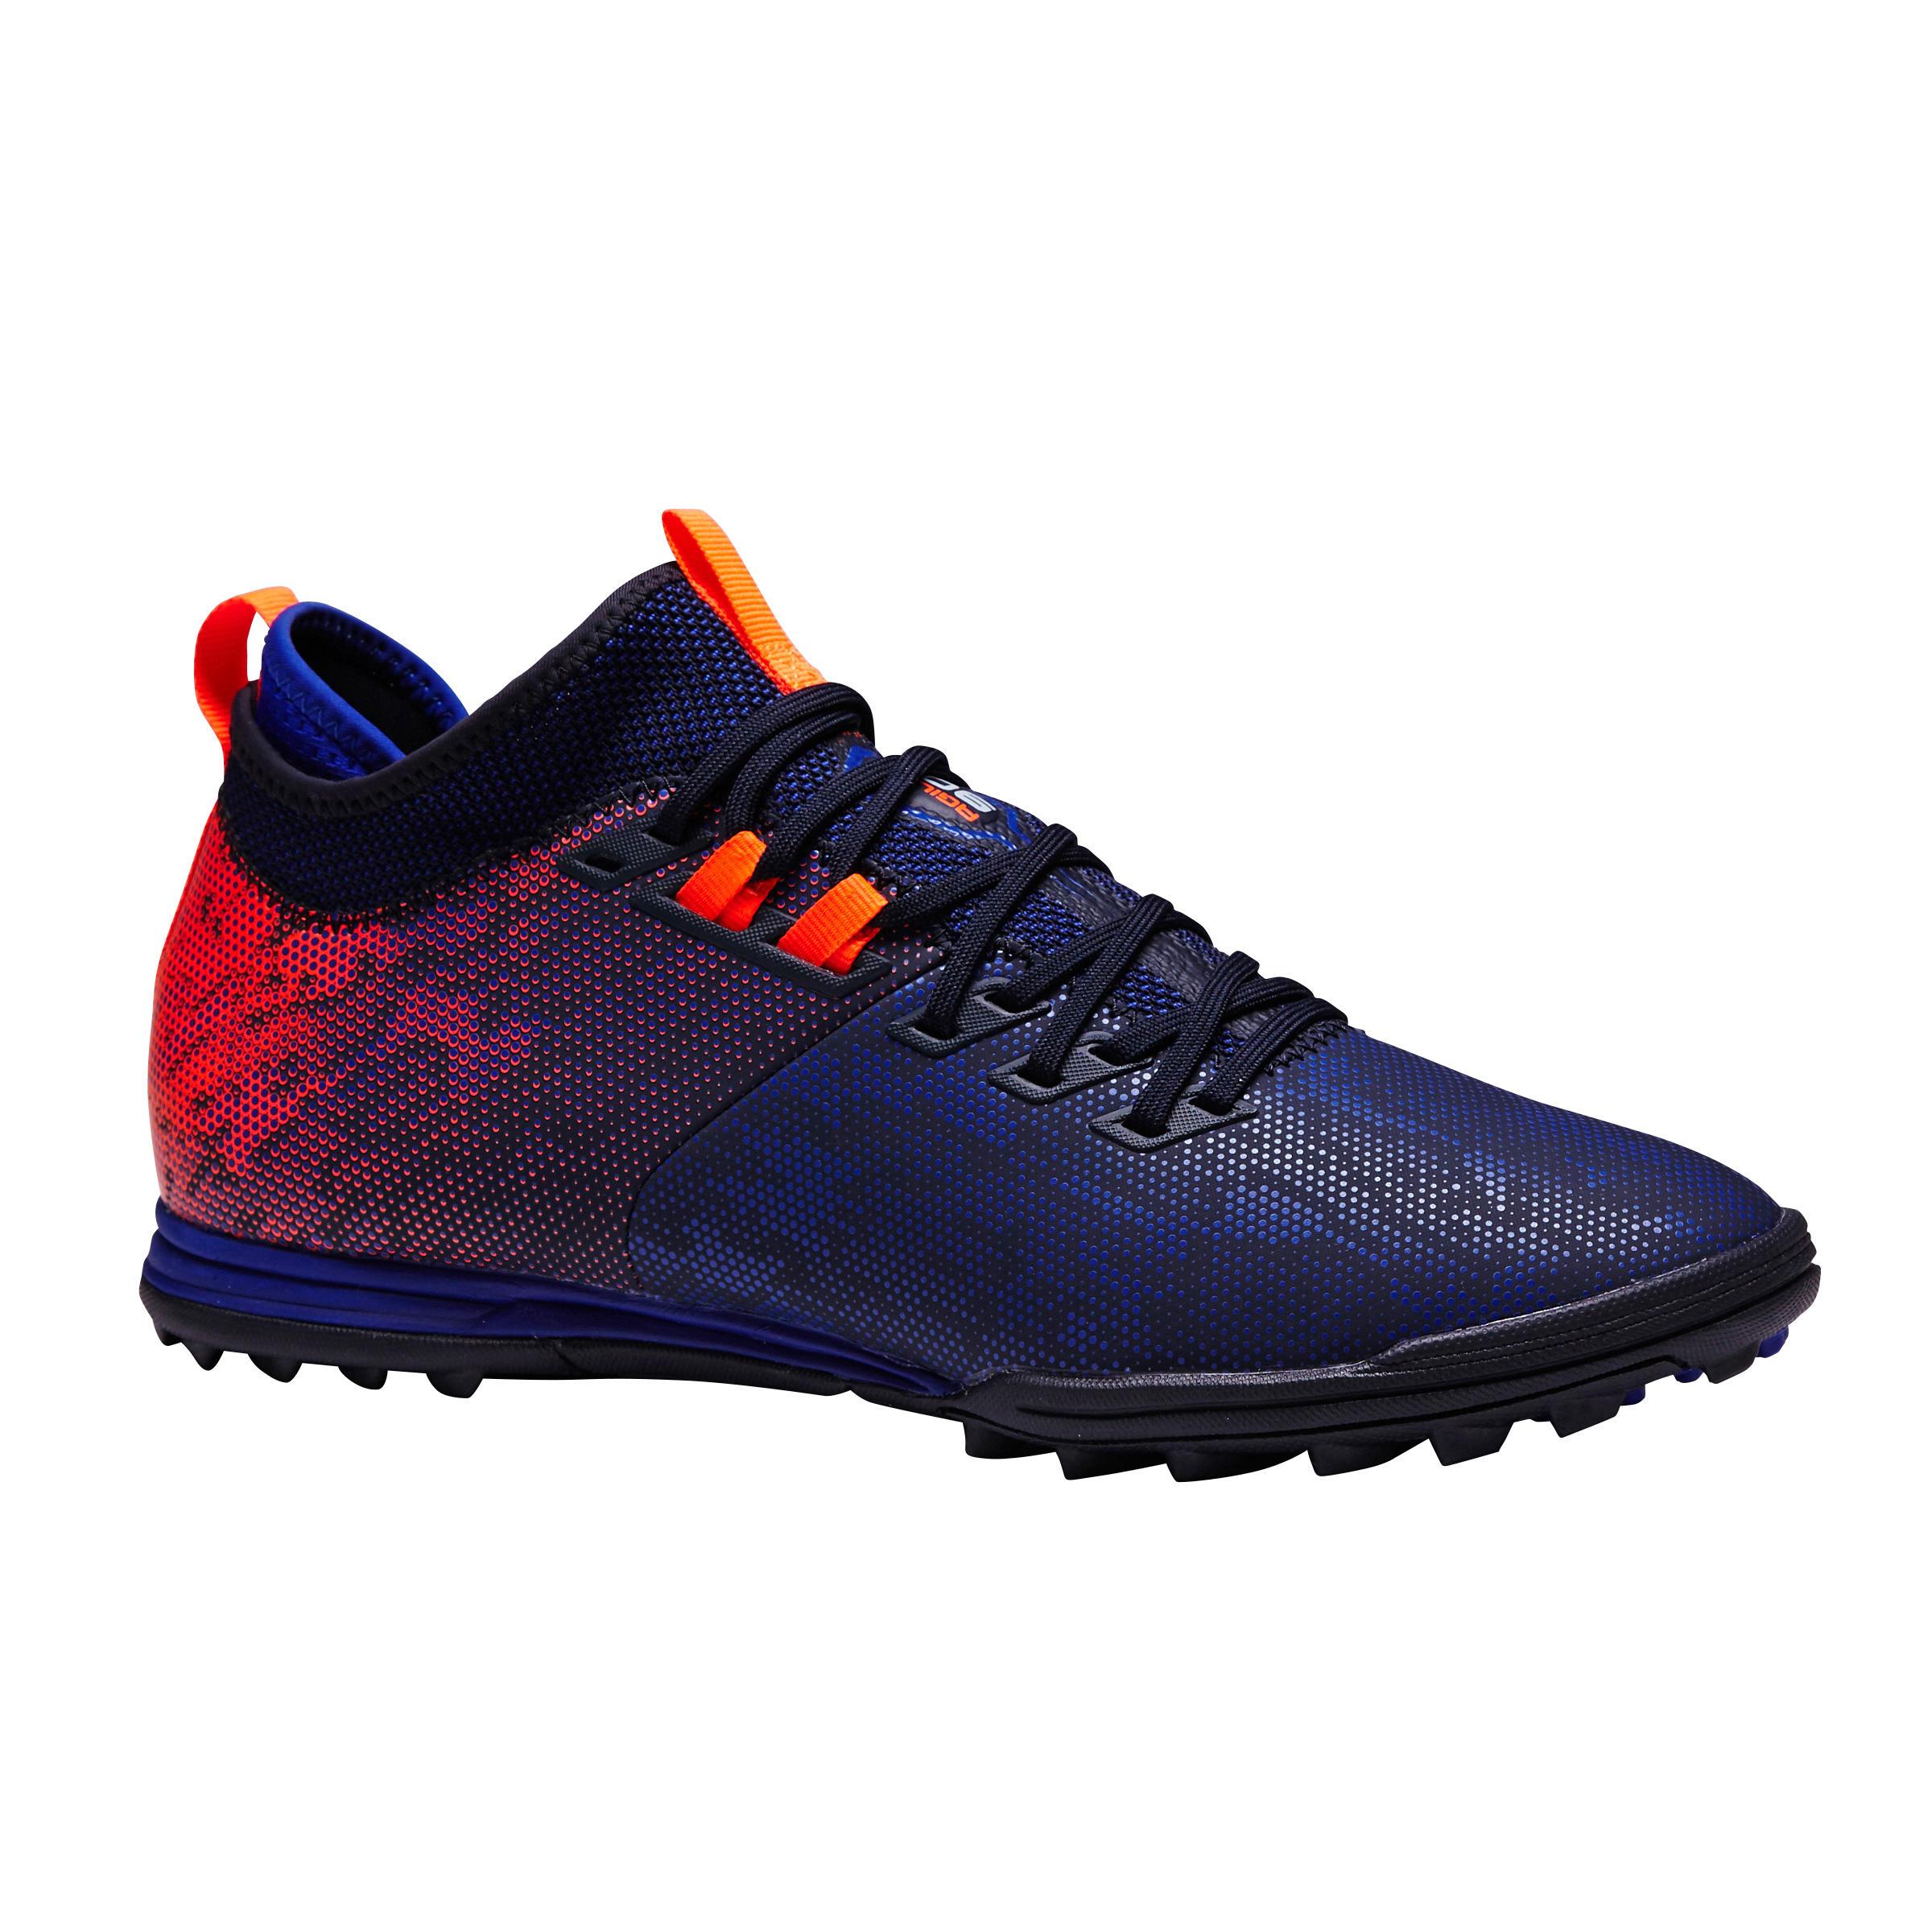 Fußballschuhe Multinocken Agility 900 HG Erwachsene blau/orange | Schuhe > Sportschuhe > Fußballschuhe | Blau | Kipsta